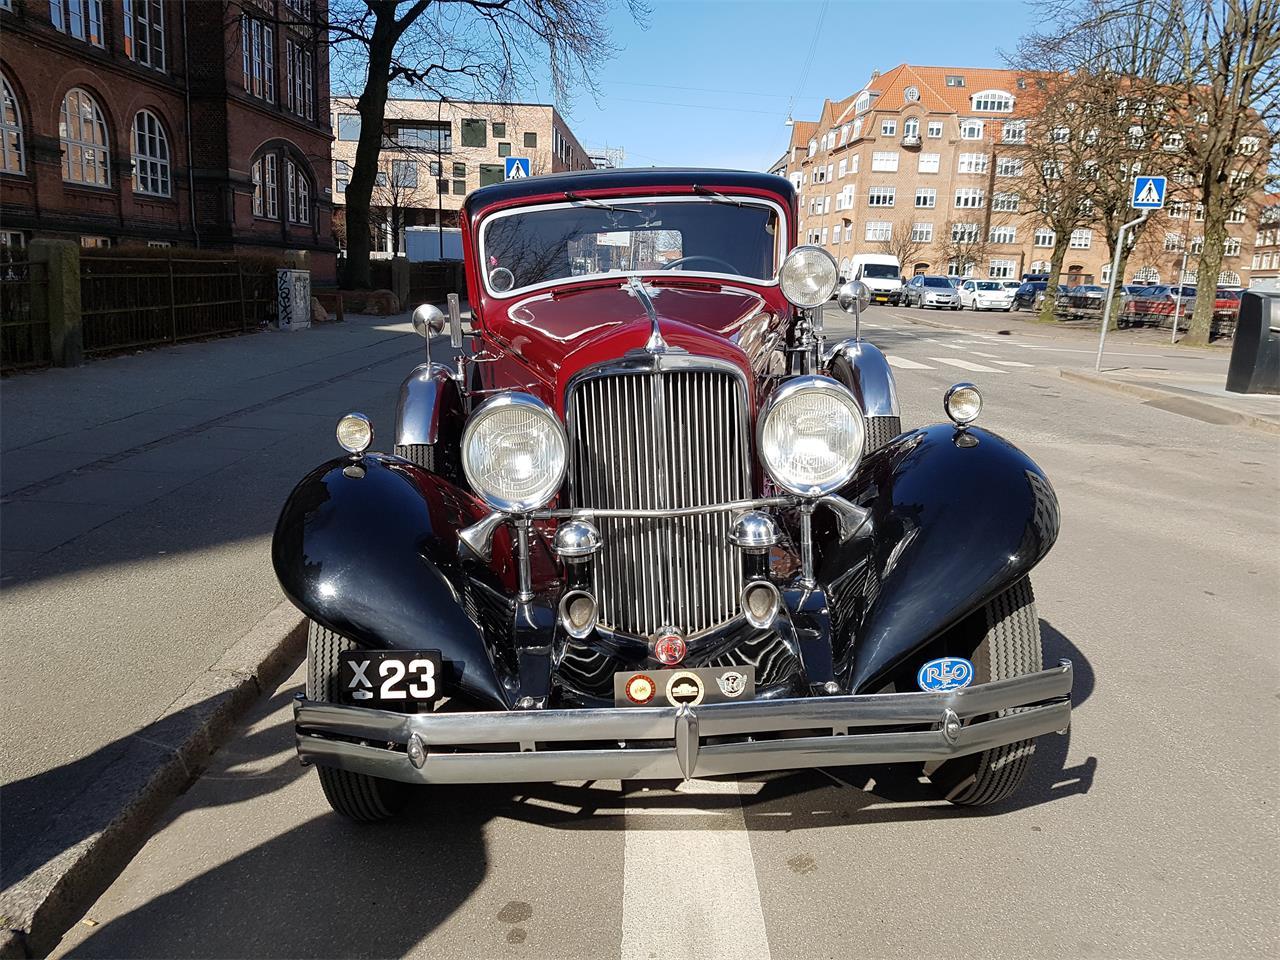 1931 REO Royale Elite (CC-1352616) for sale in Ryomgaard, Danmark